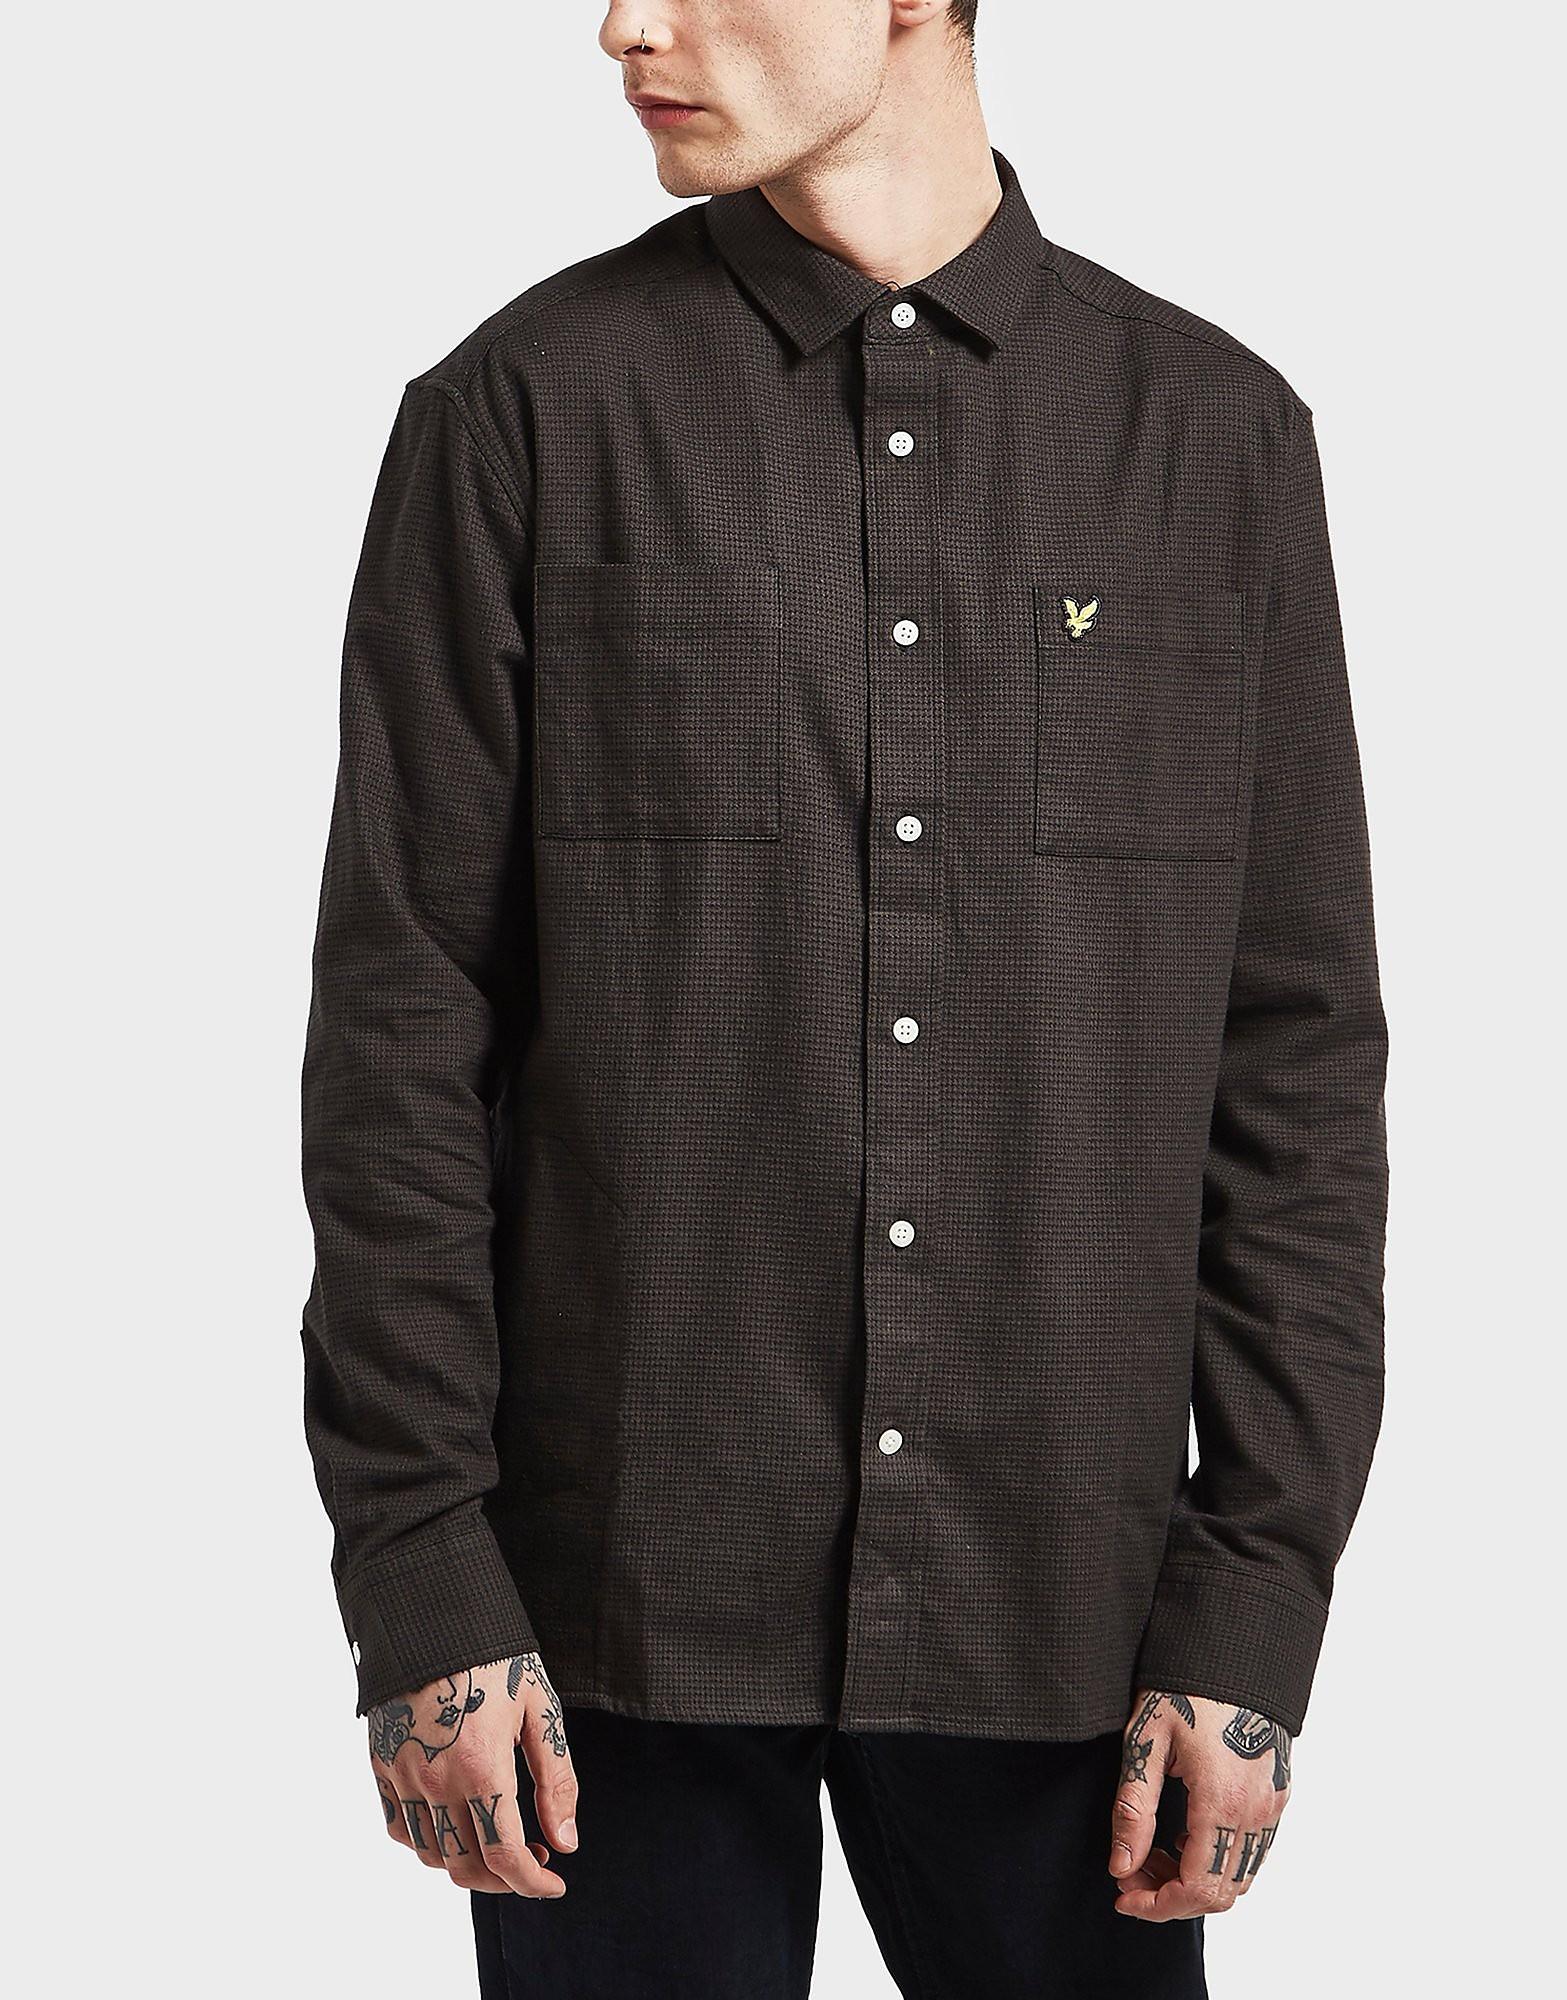 Lyle & Scott Houndstooth Long Sleeve Shirt